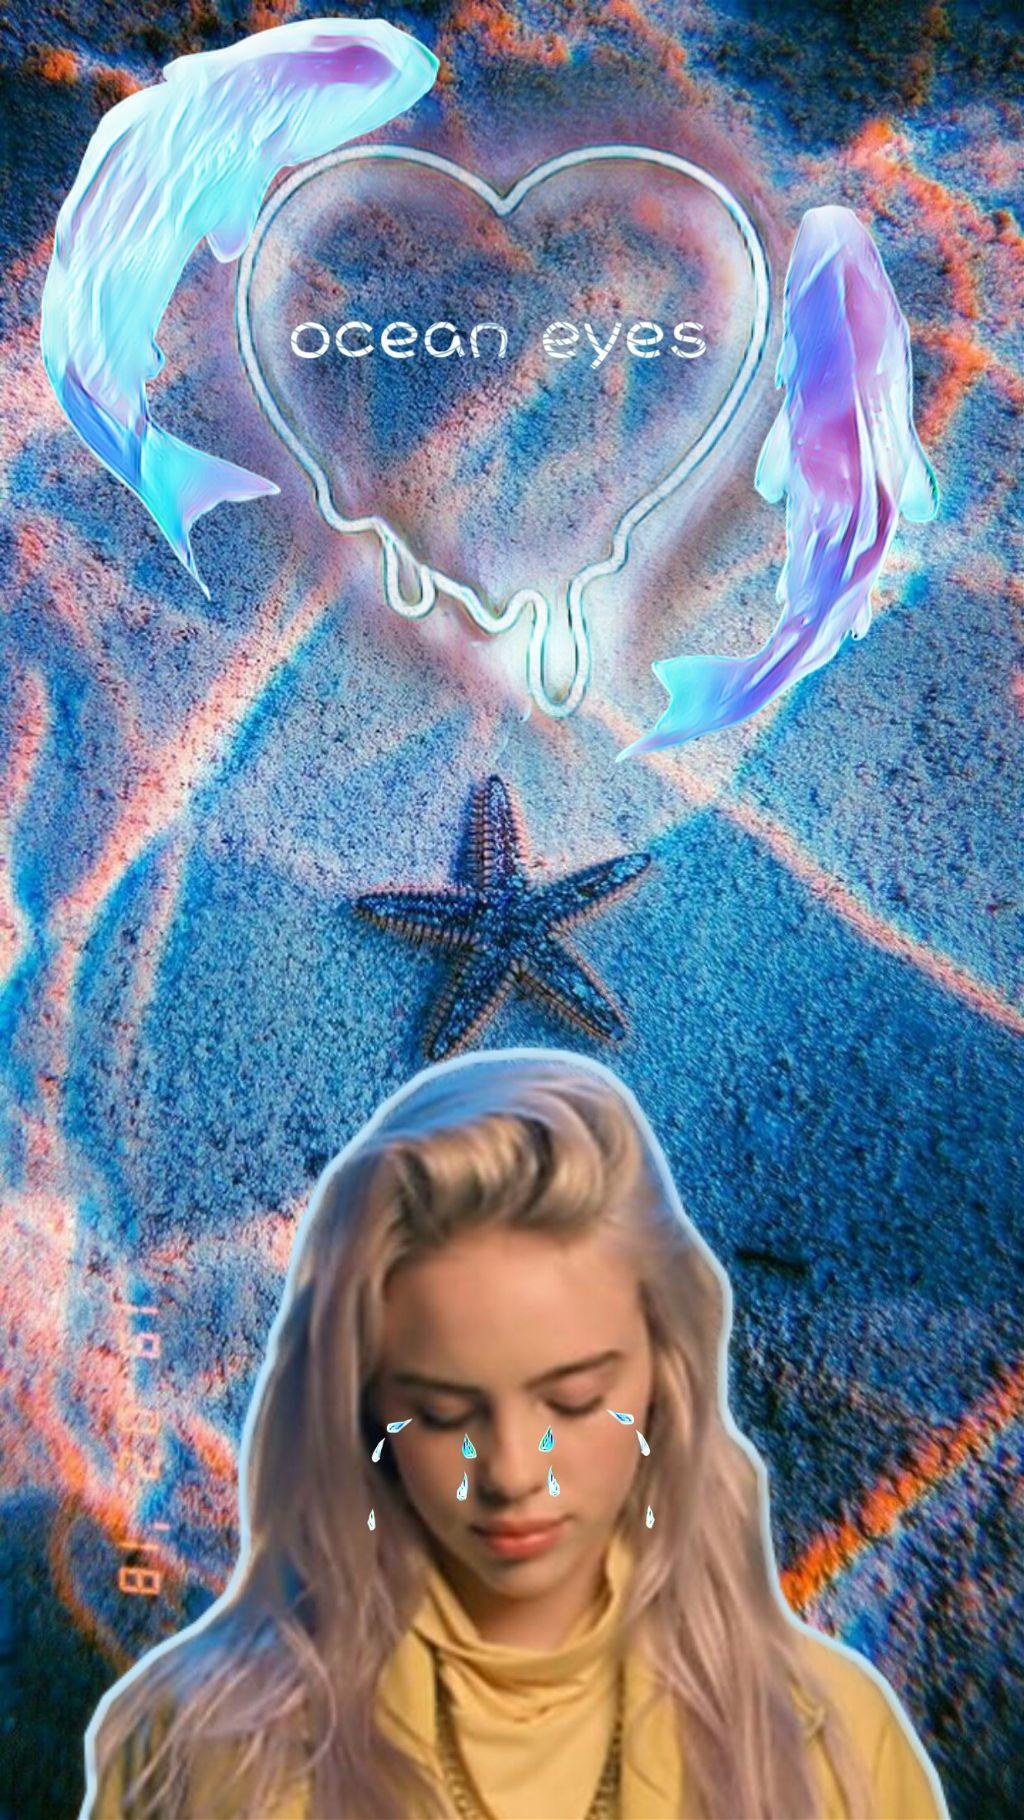 Freetoedit Billieeilish Wallpaper Iphone Like View Inte